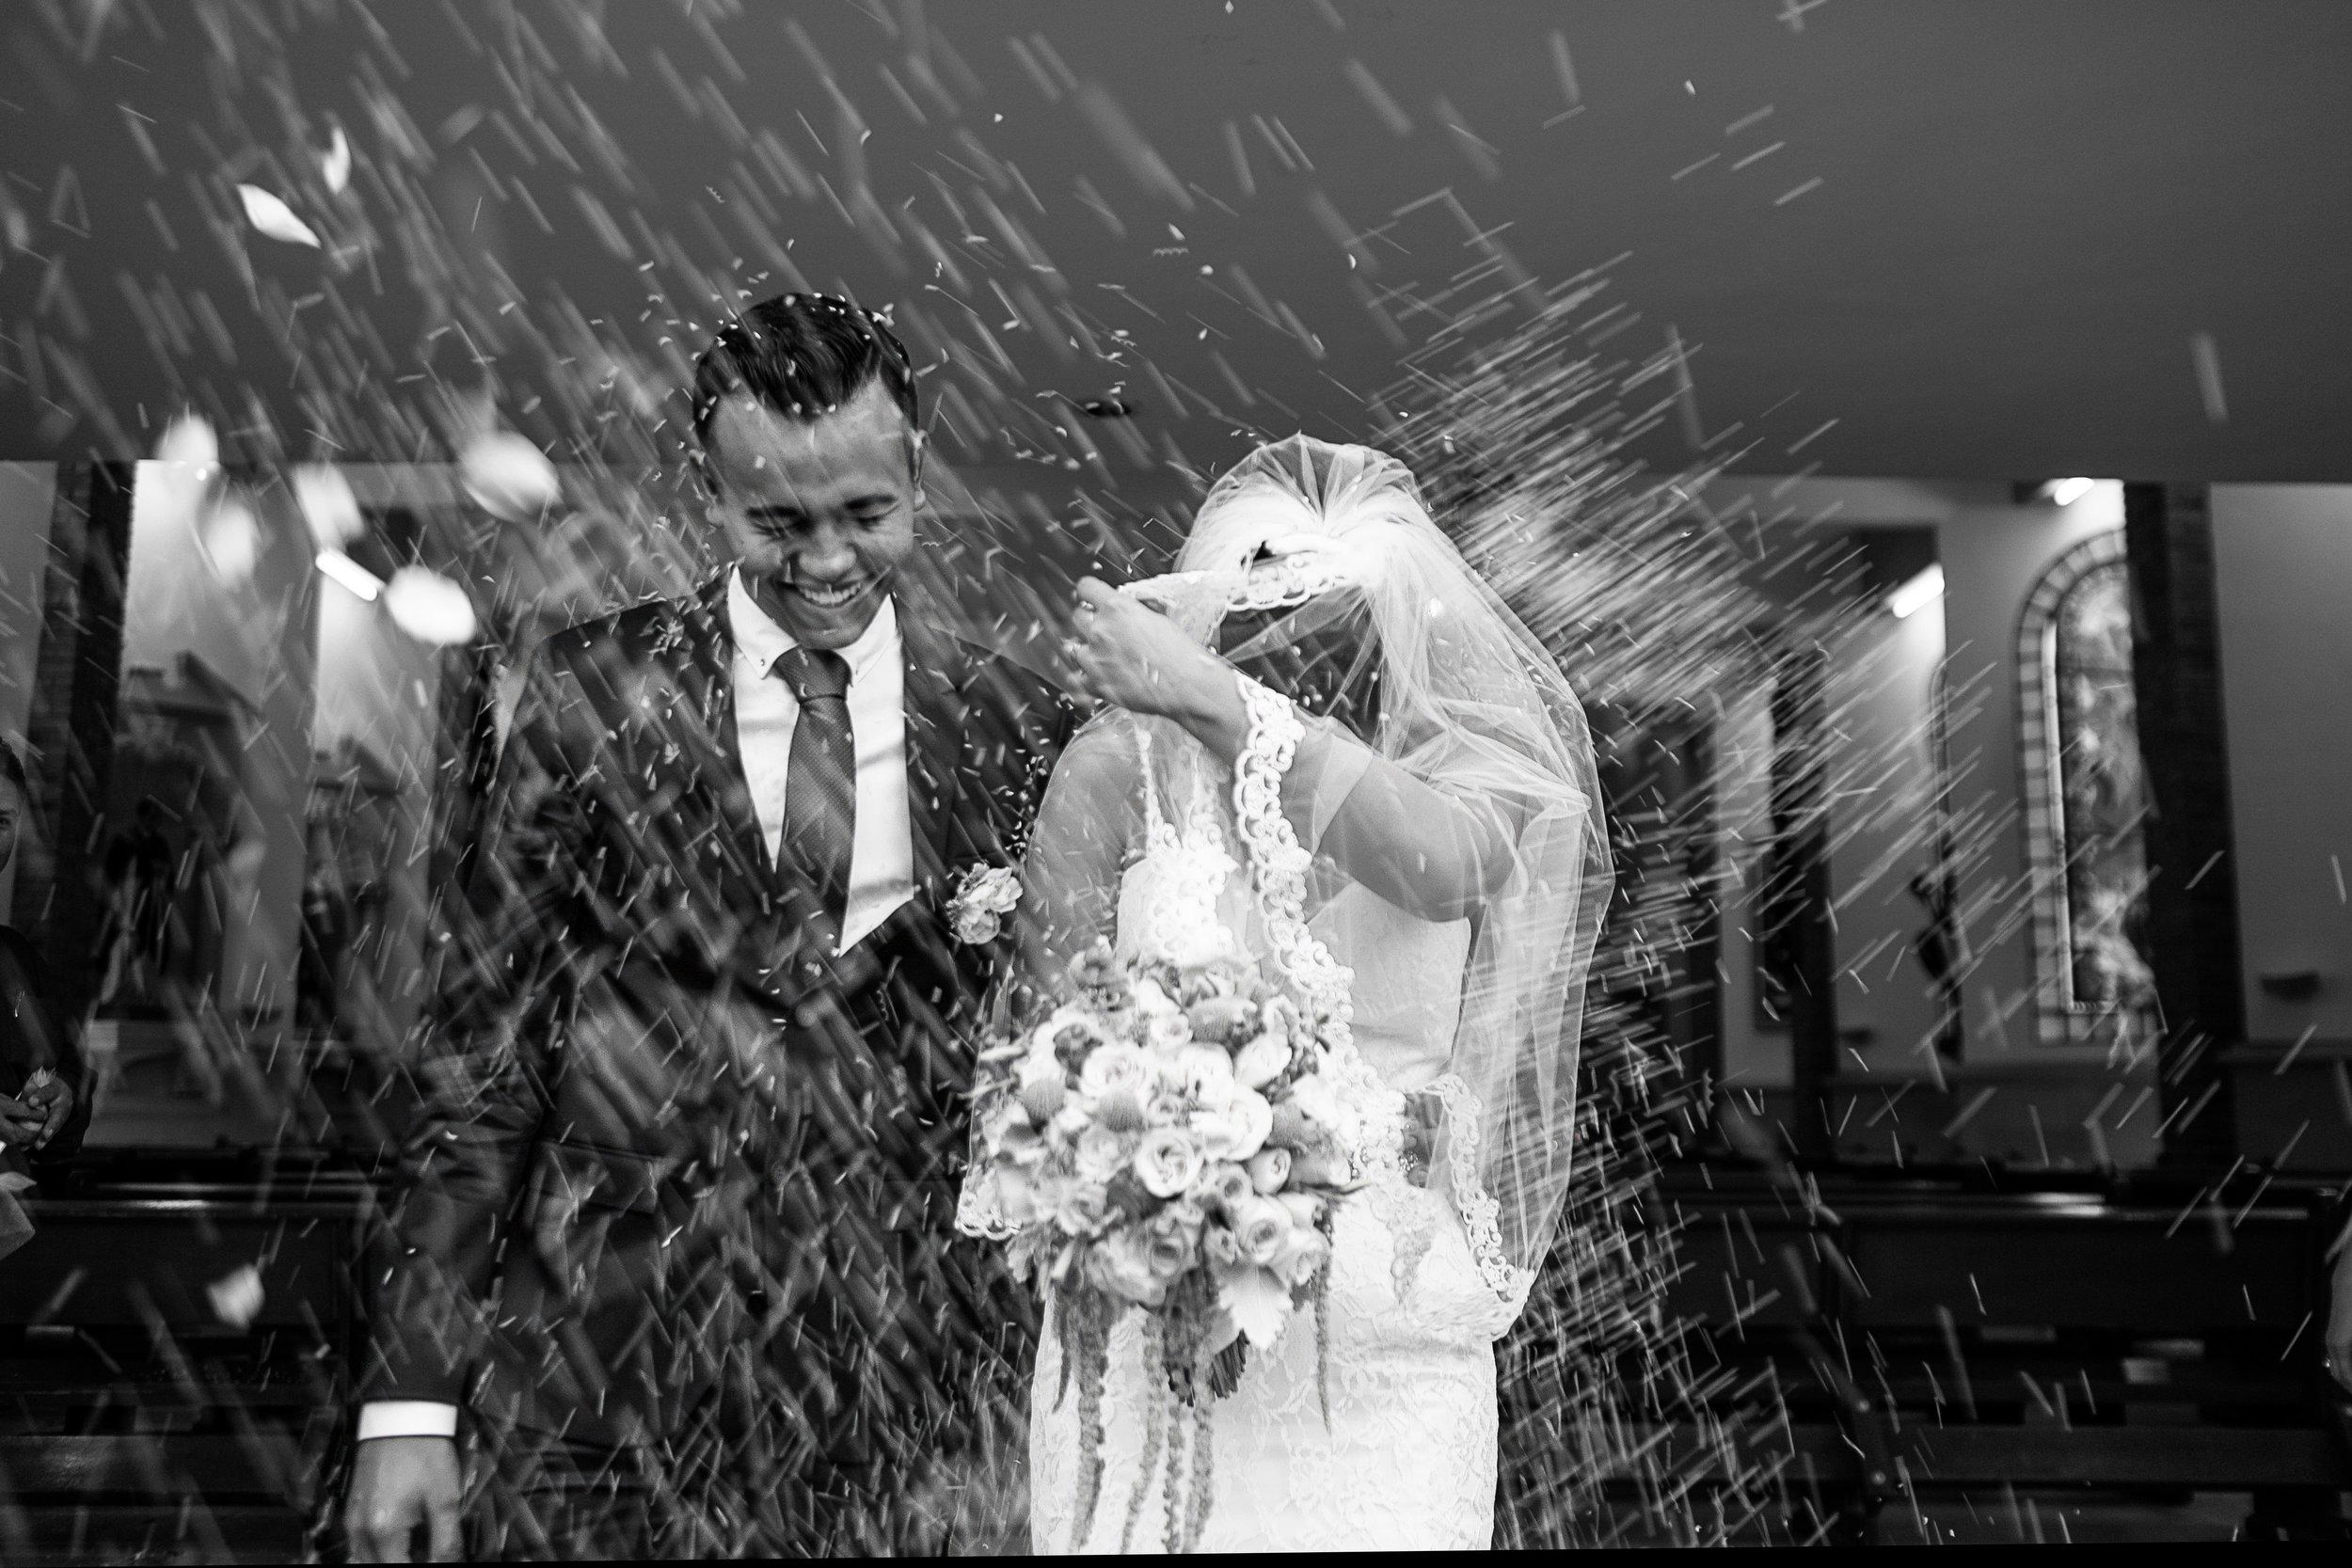 Lluvia de arroz a la salida de la feliz pareja al terminar su ceremonia religiosa de boda